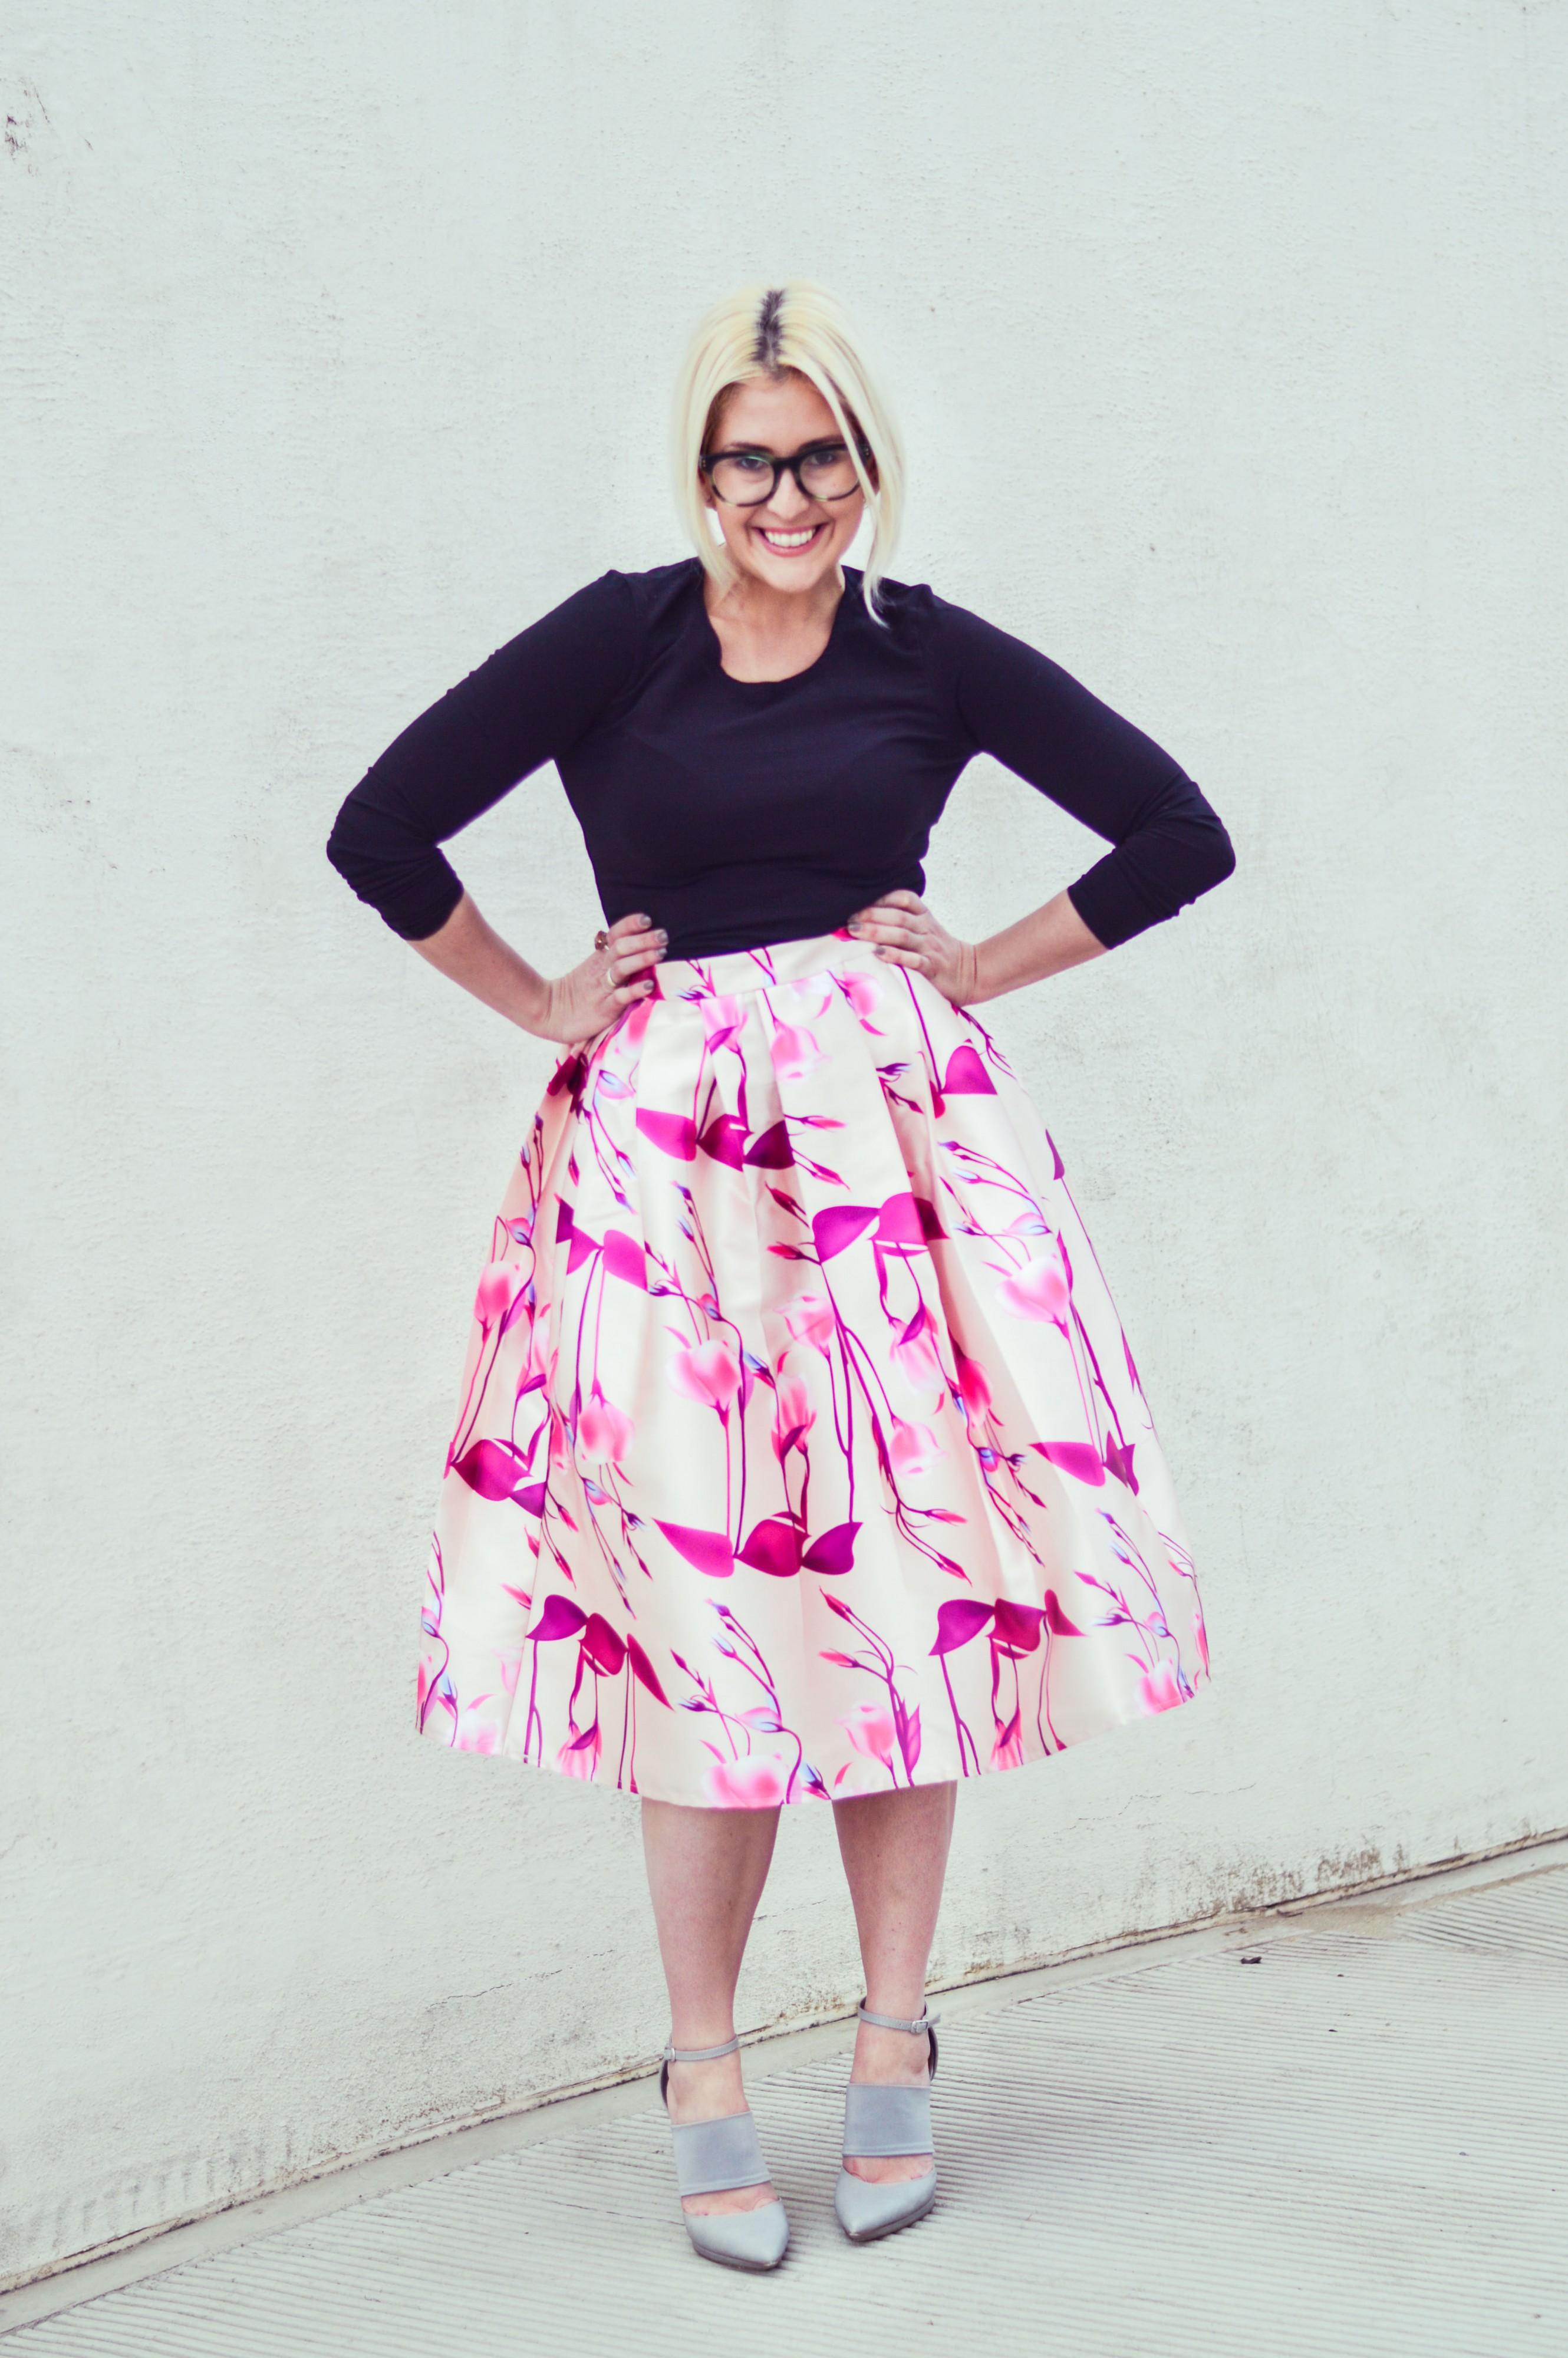 KatWalkSF - Midi Skirt